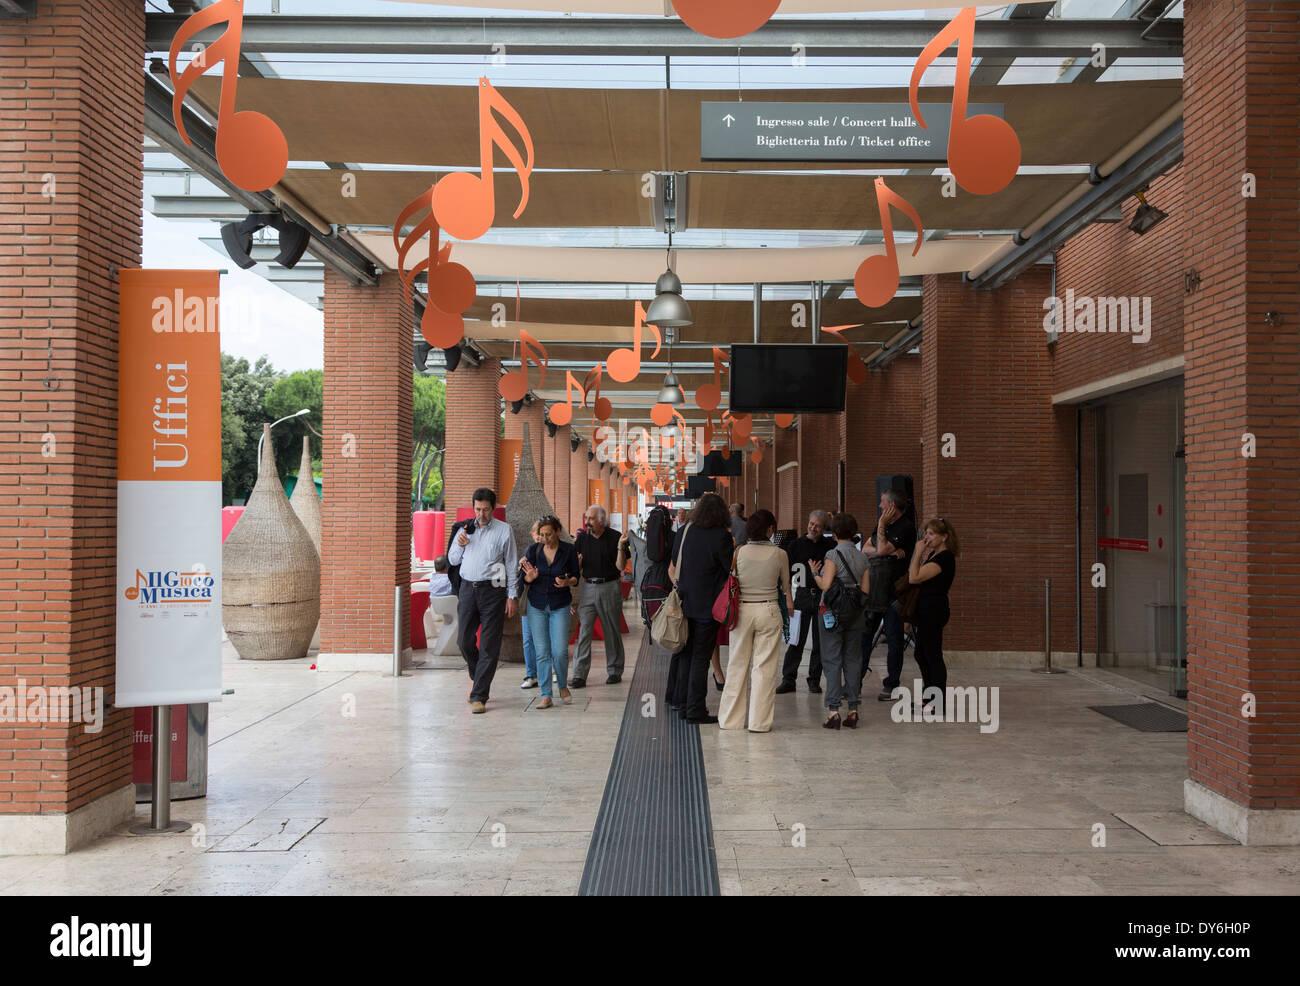 Sale Parco Della Musica Roma : Outdoor corridor auditorium parco della musica rome italy stock